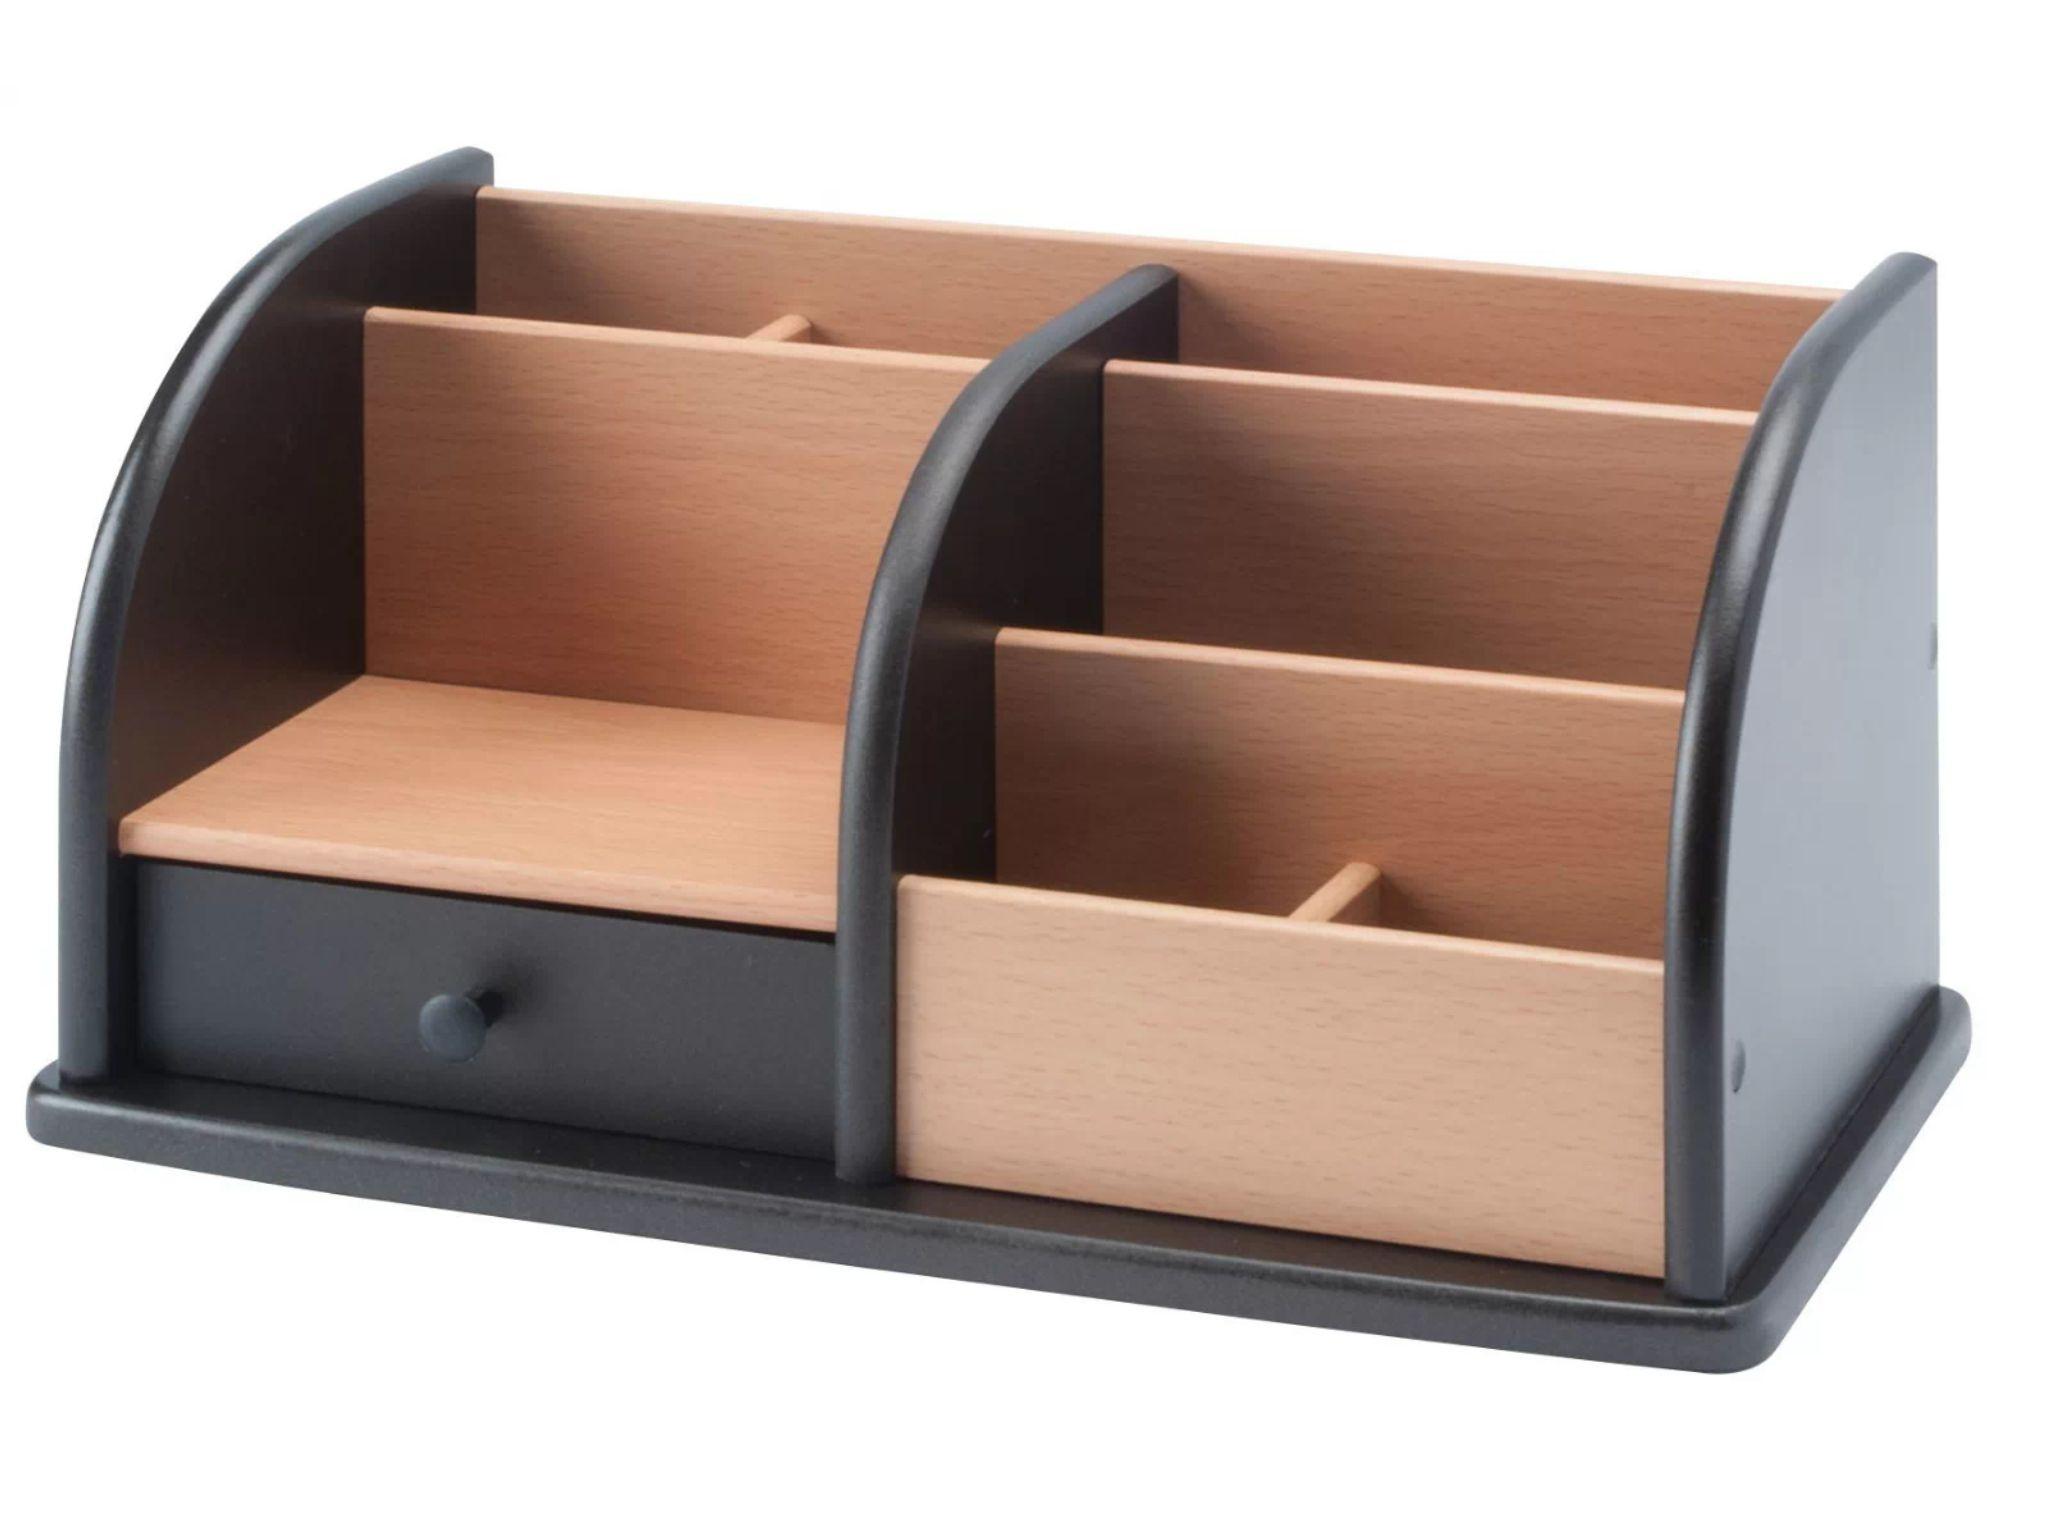 Osco Wooden desk organiser - Black and beech staionary pen storage